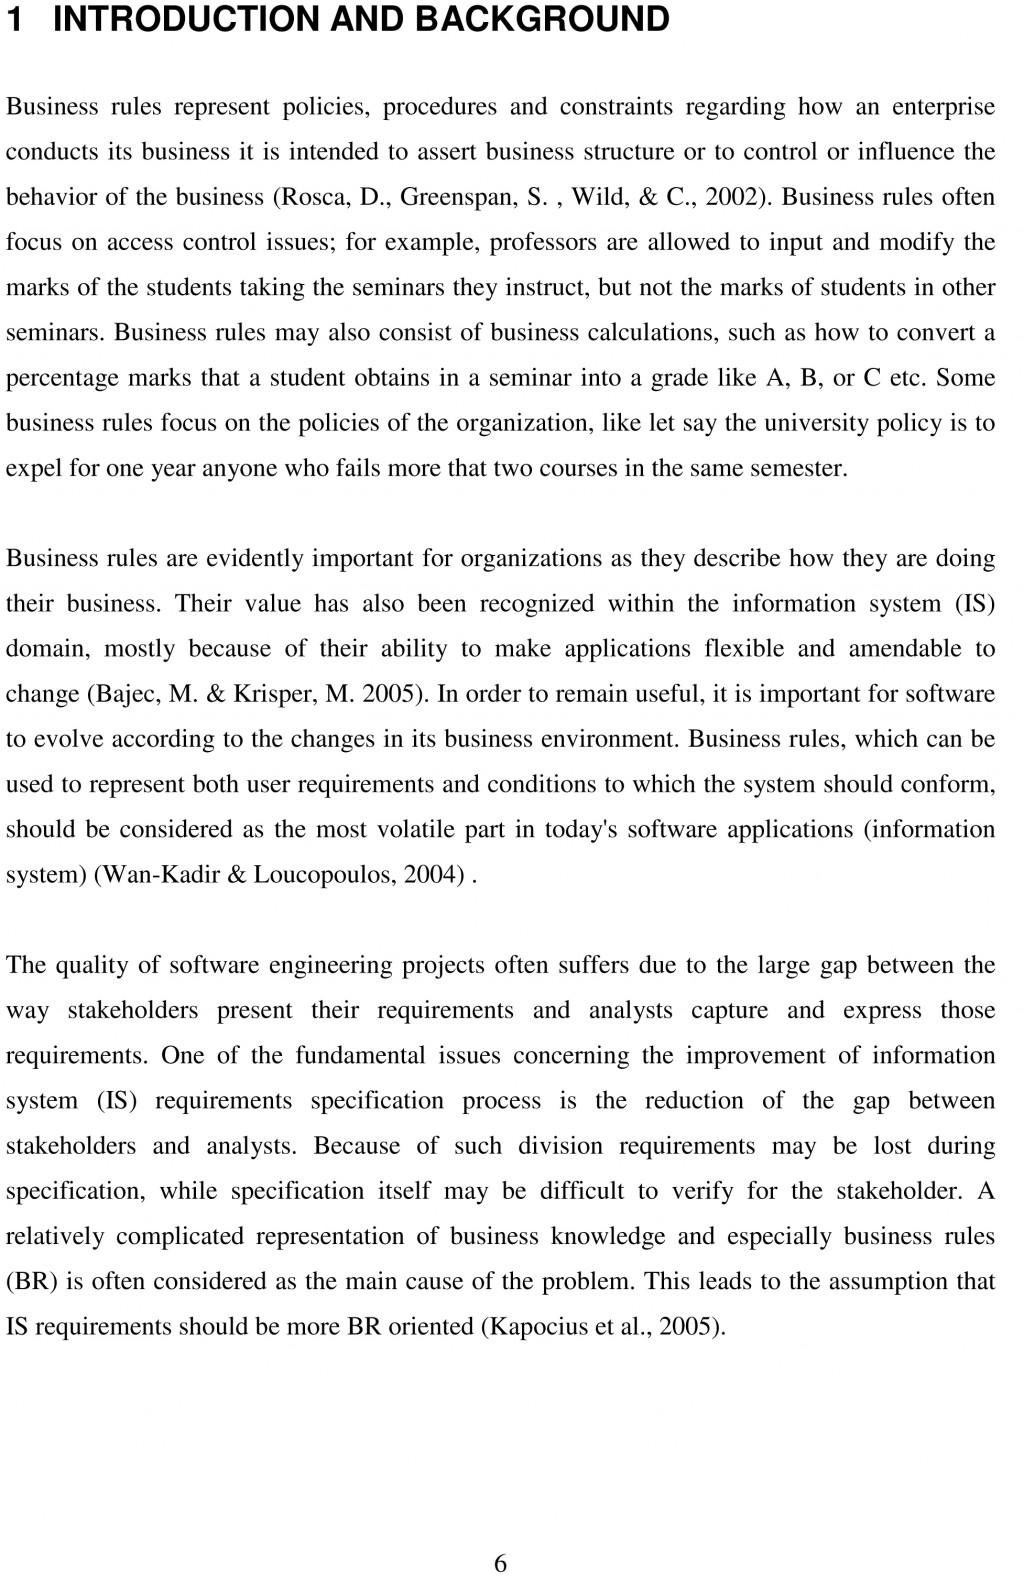 017 Thesis Free Sample1 Write My Essay For Shocking App Argumentative Online Large